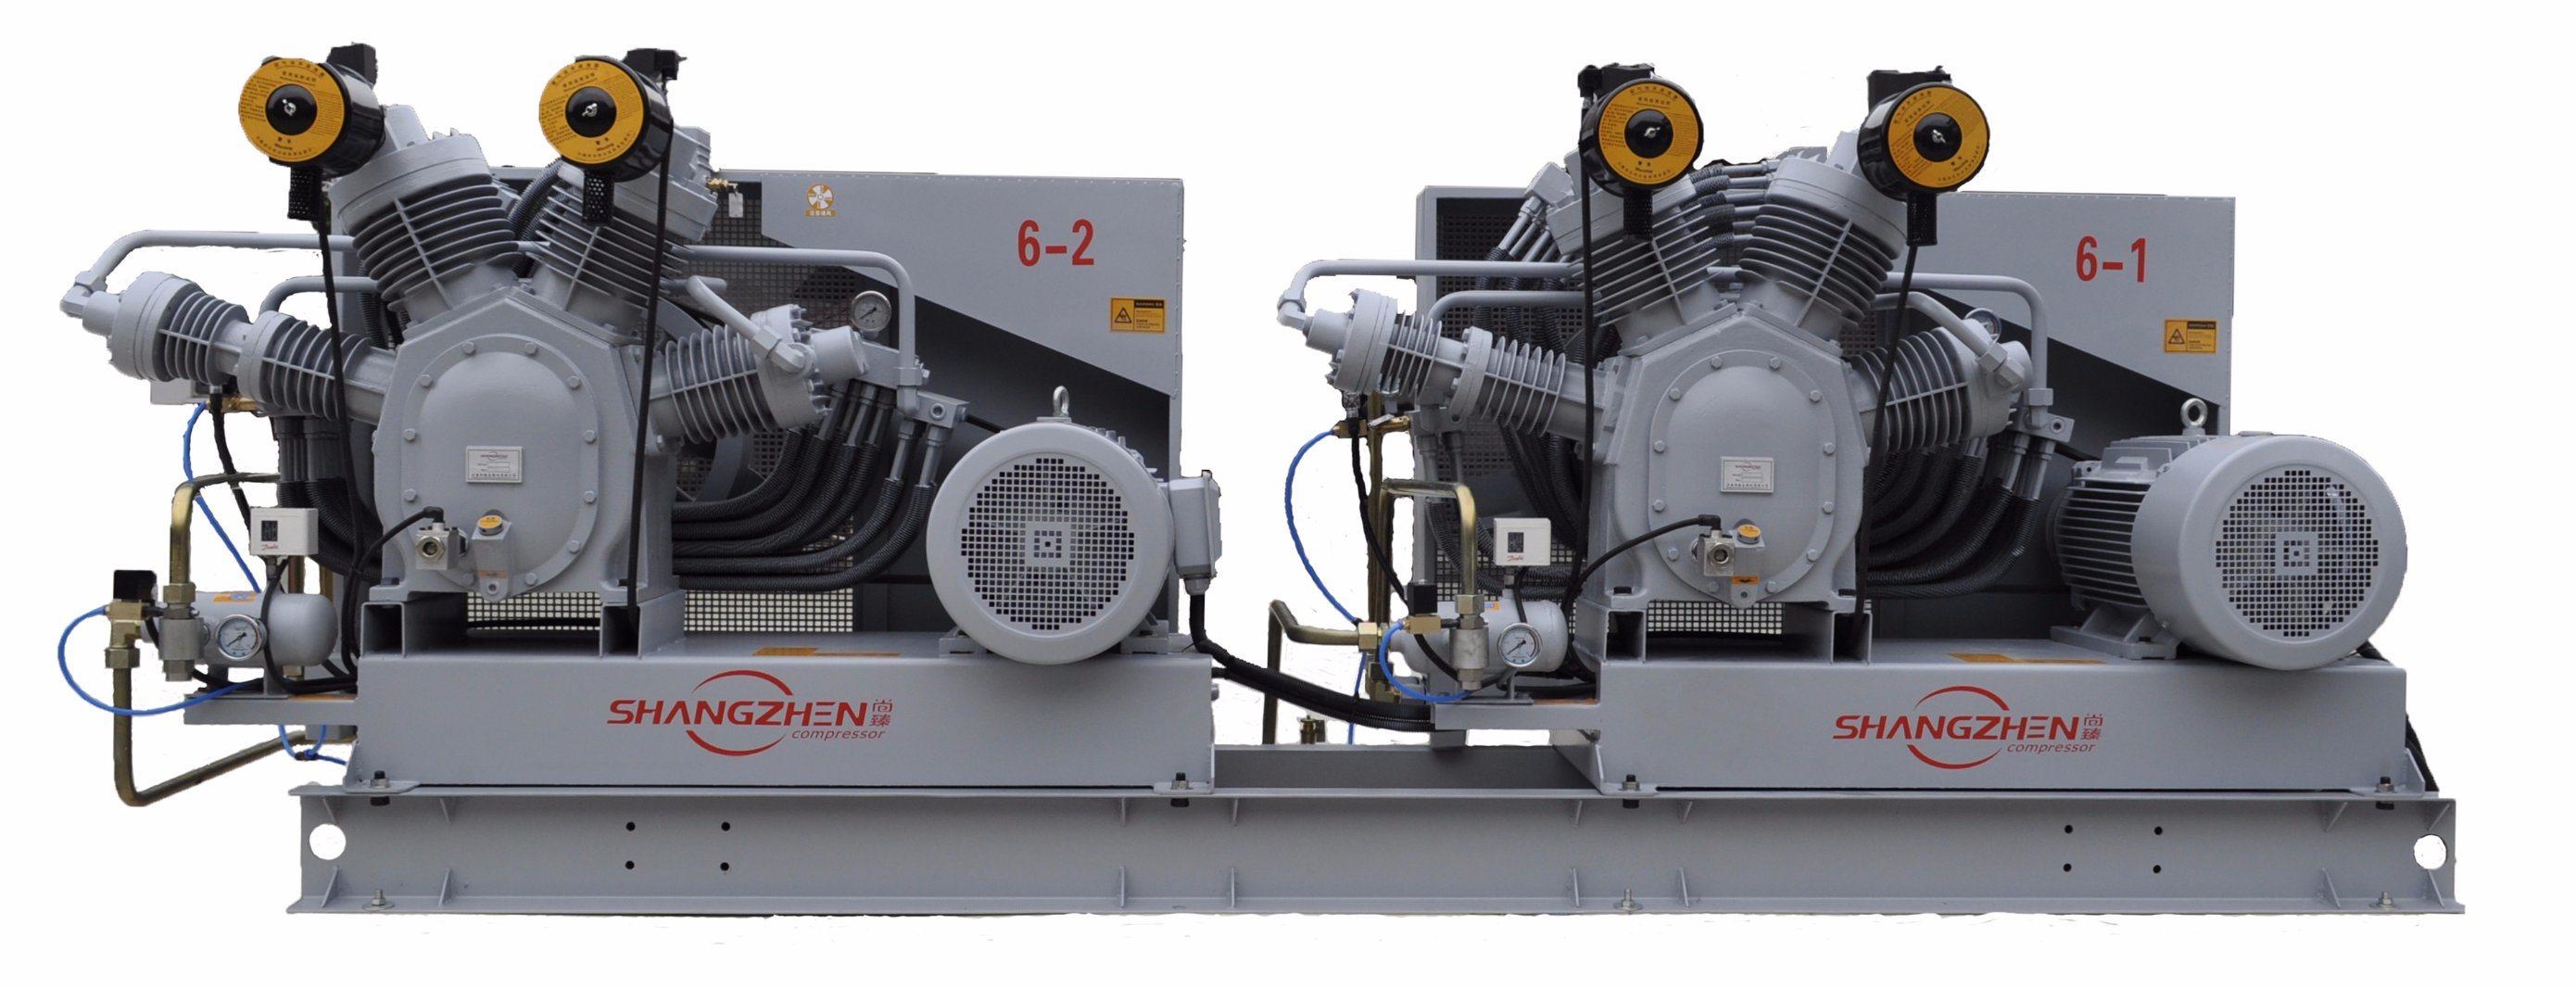 (2-SH-4.0/30) 30bar 35bar 40bar Pet Bottle-Blowing Dedicated Air Compressor Medium High Pressure Air Compressor